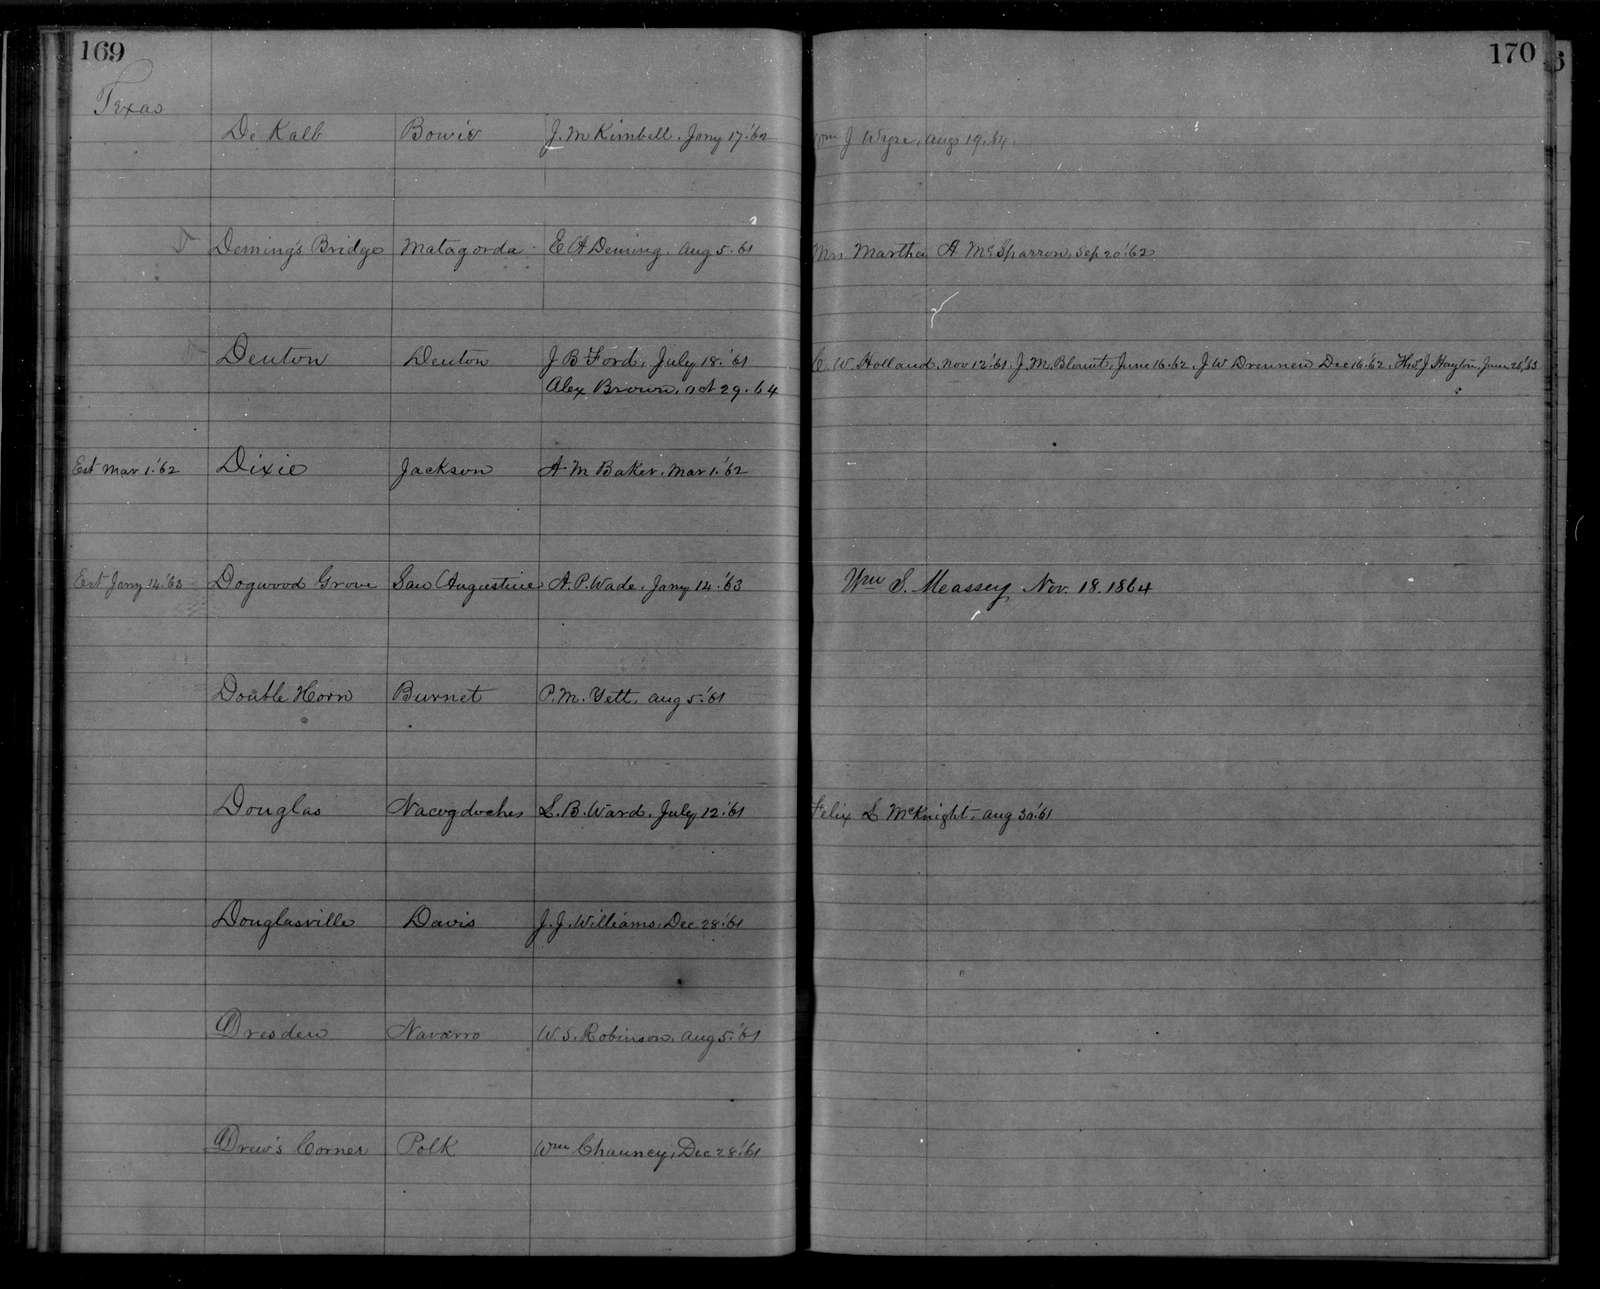 Confederate States of America records: Microfilm Reel 53